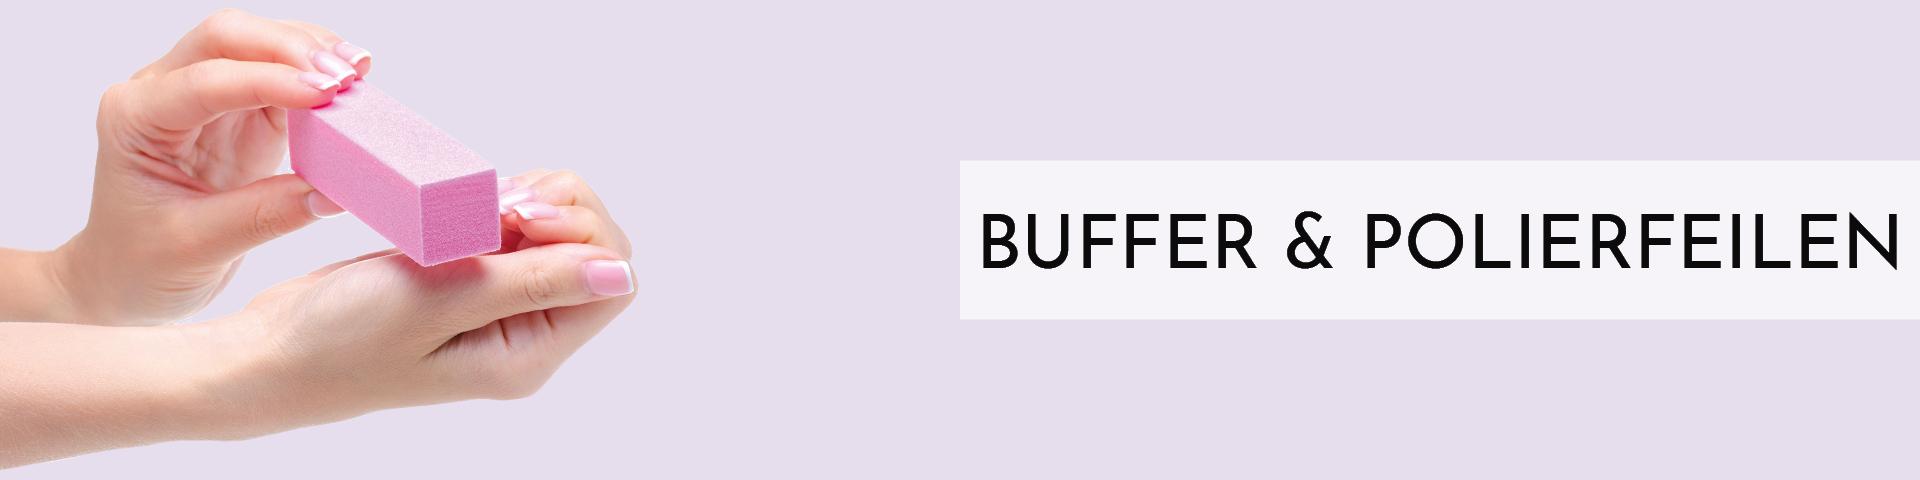 Buffer & Polierfeilen